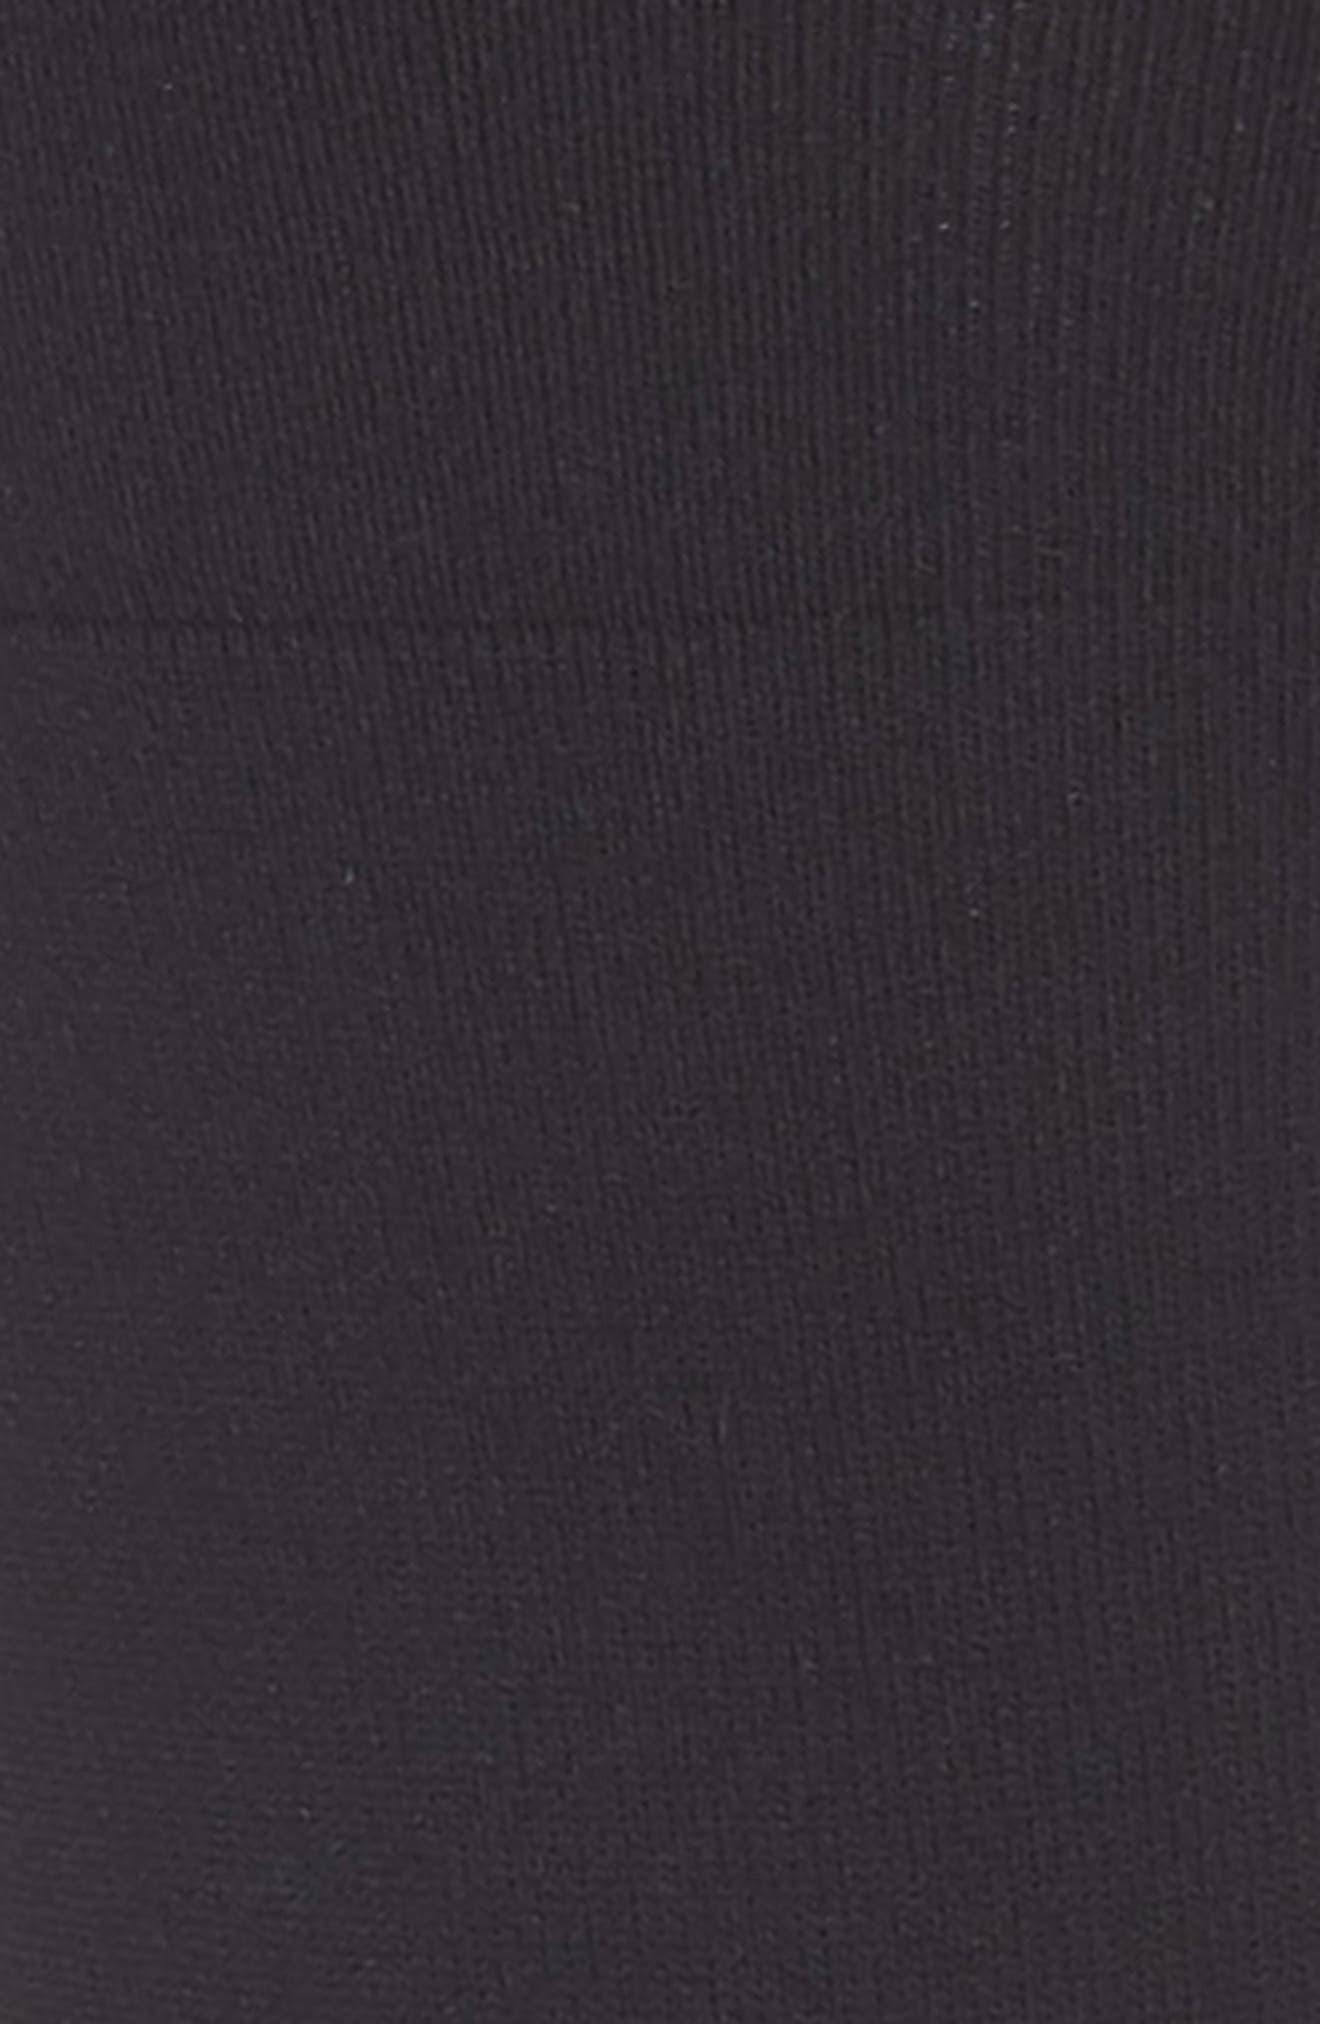 Ultra Sleek Crew Socks,                         Main,                         color, BLACK